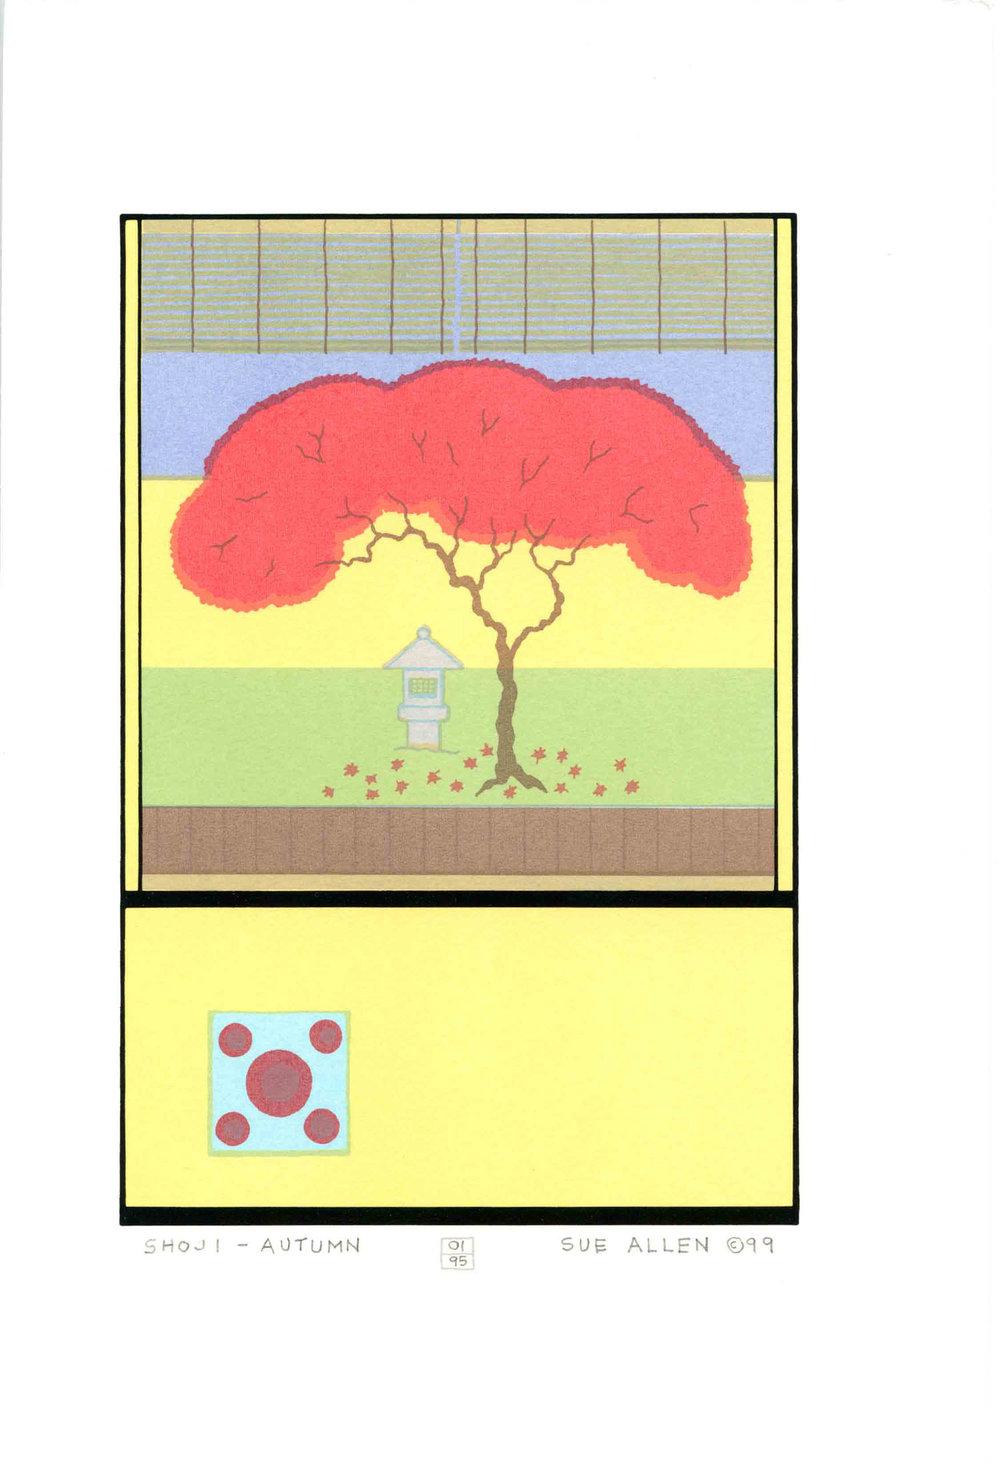 SHOJI- AUTUMN